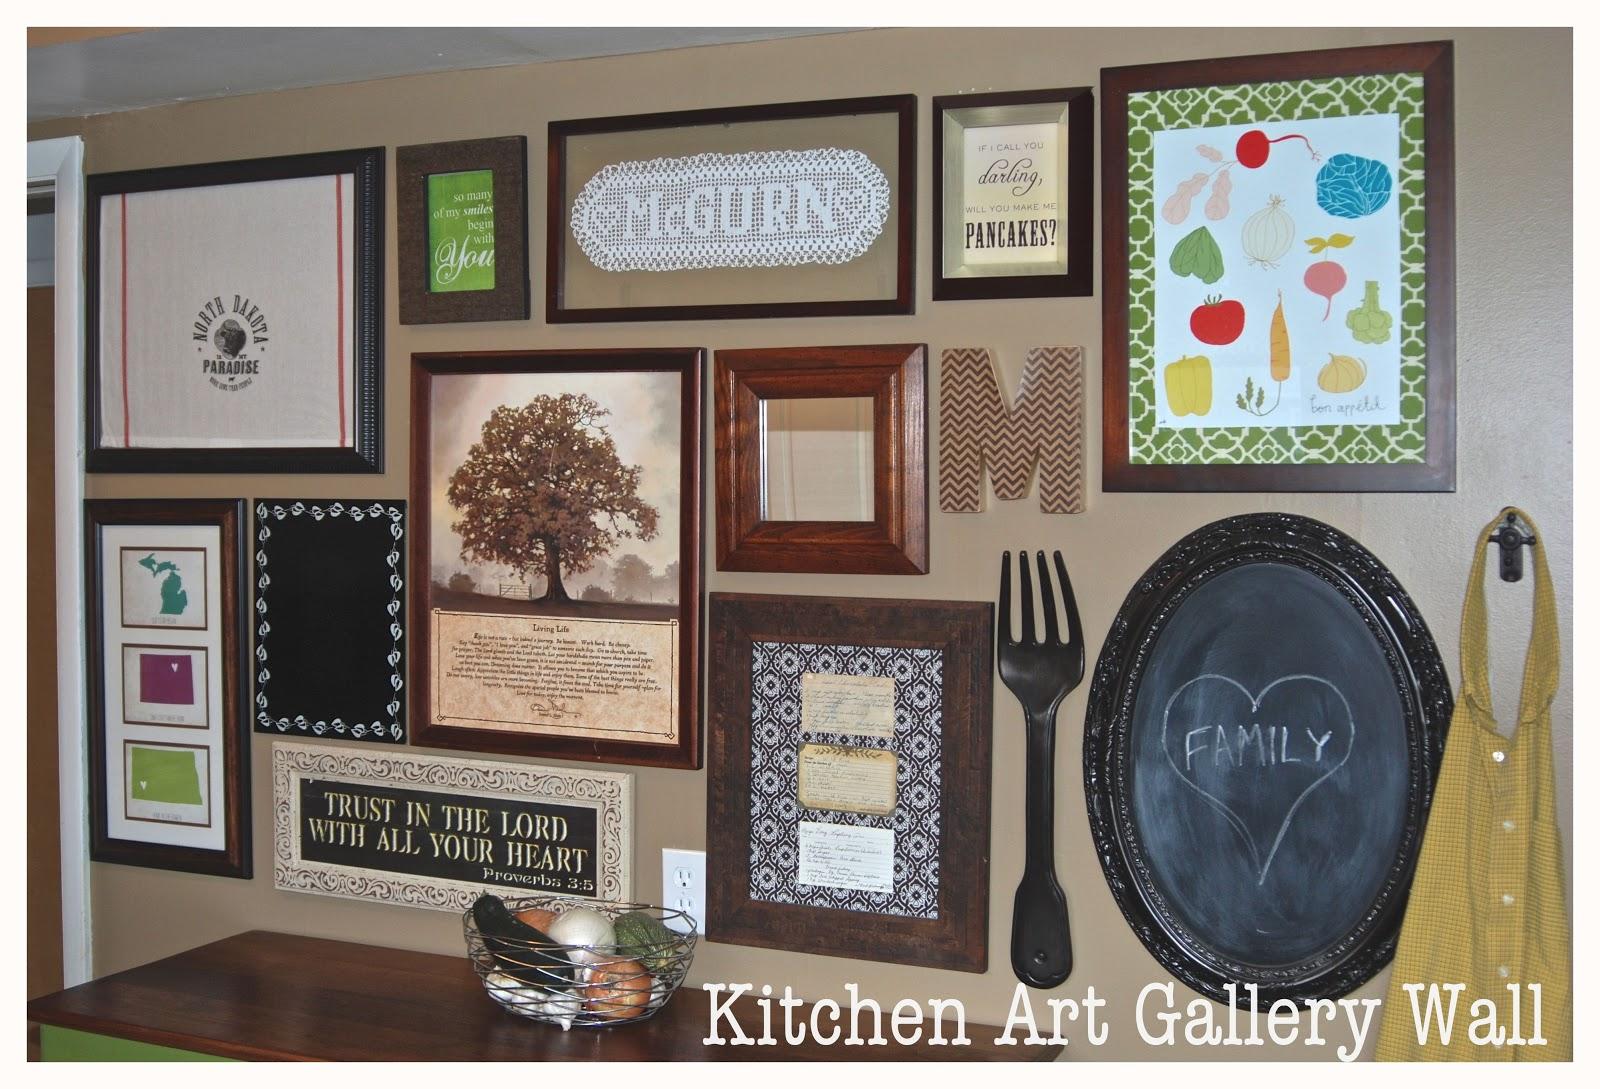 Kitchen Art Gallery Wall